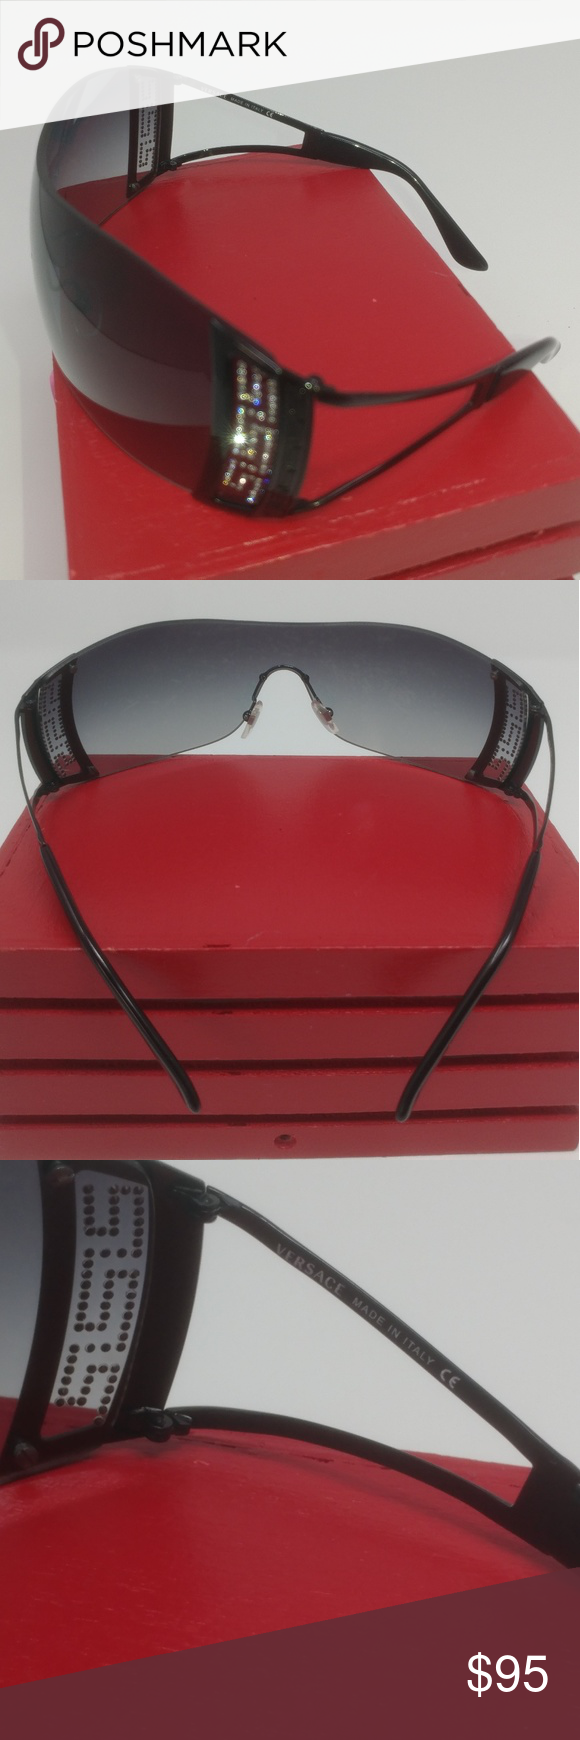 873fddbdd9ea Versace 2058B Sunglasses